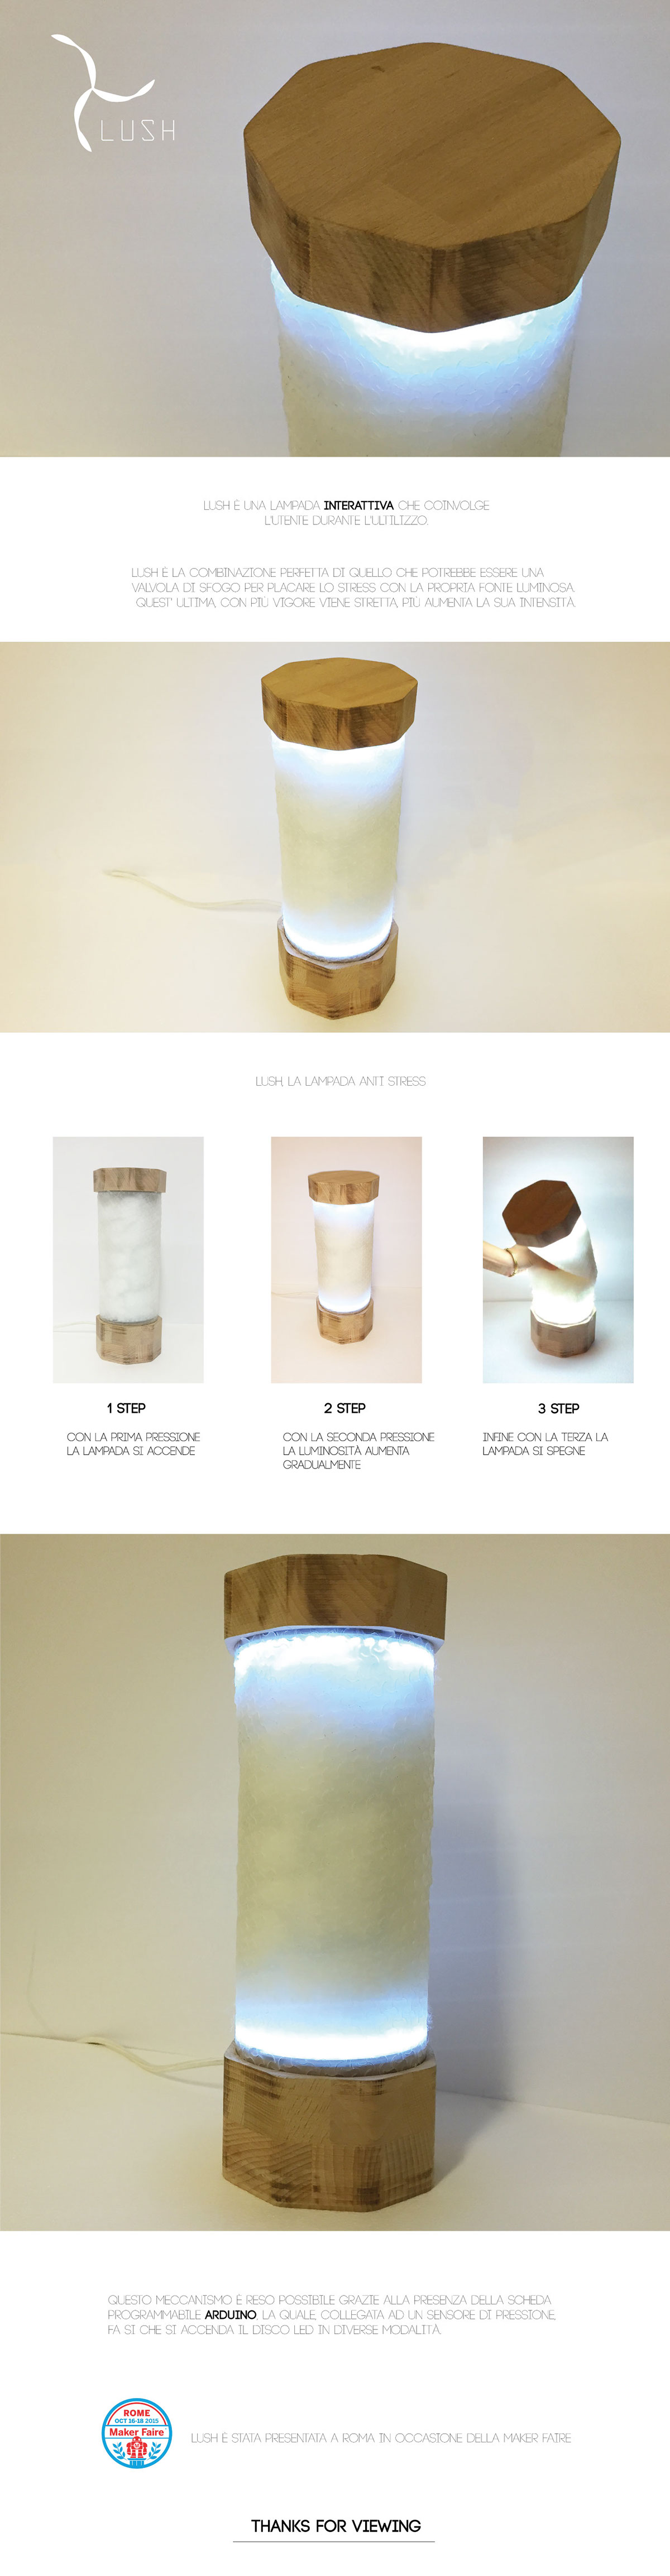 Lamp,design,Arduino,interaction,makerfaire,lush,ied